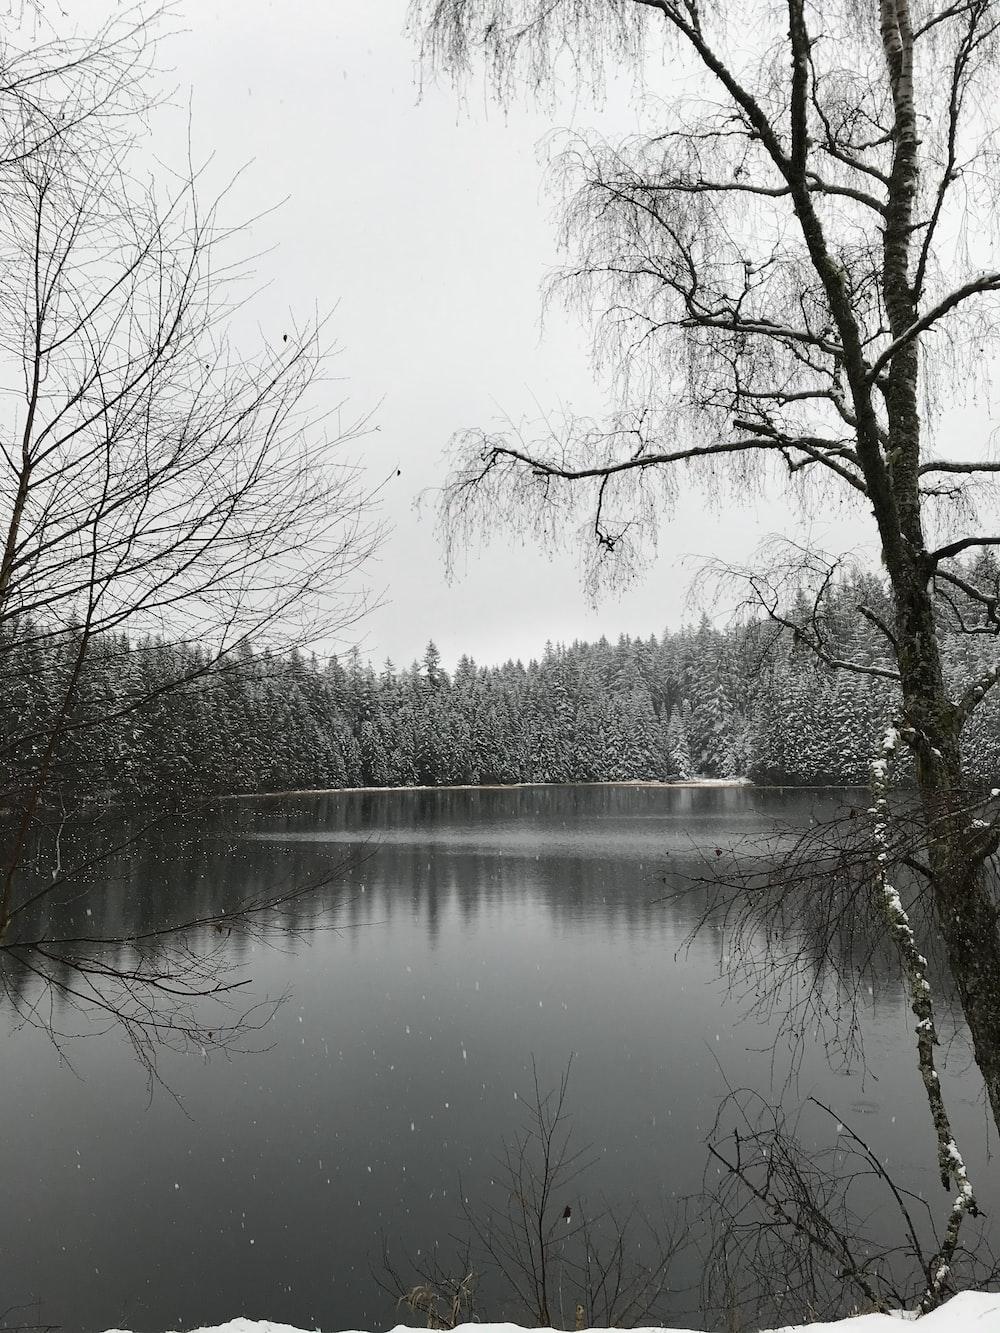 leafless trees near lake under white sky during daytime